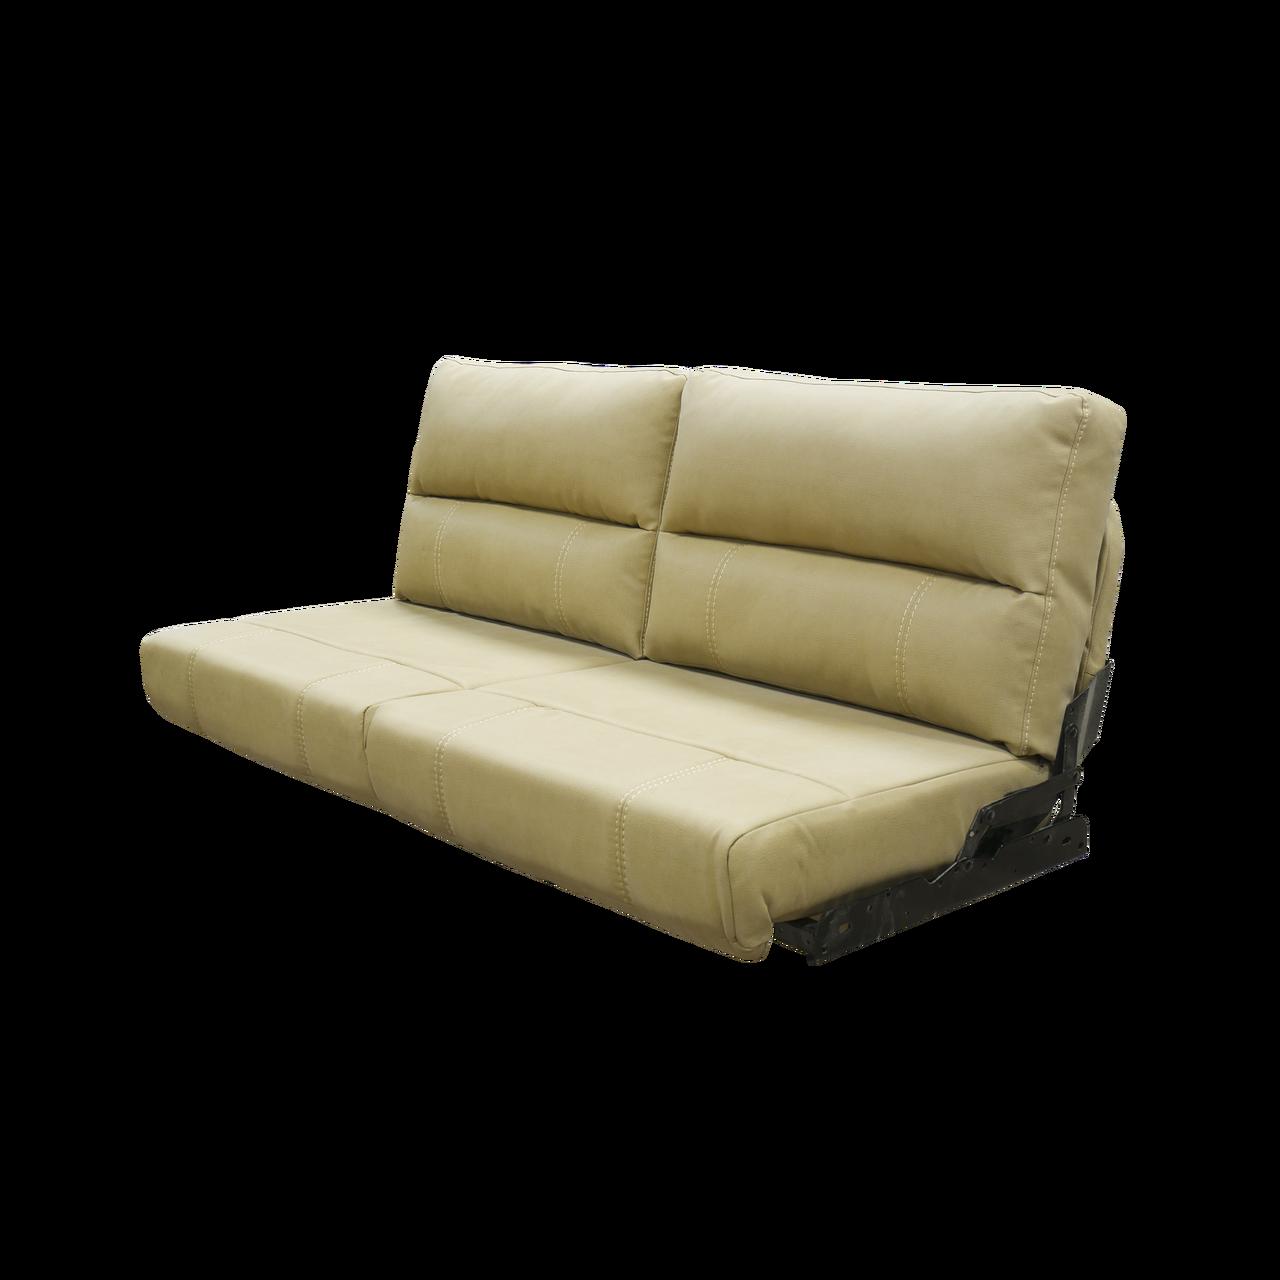 Astounding 59 Rv Flip Sofa Sleeper Sofa Machost Co Dining Chair Design Ideas Machostcouk